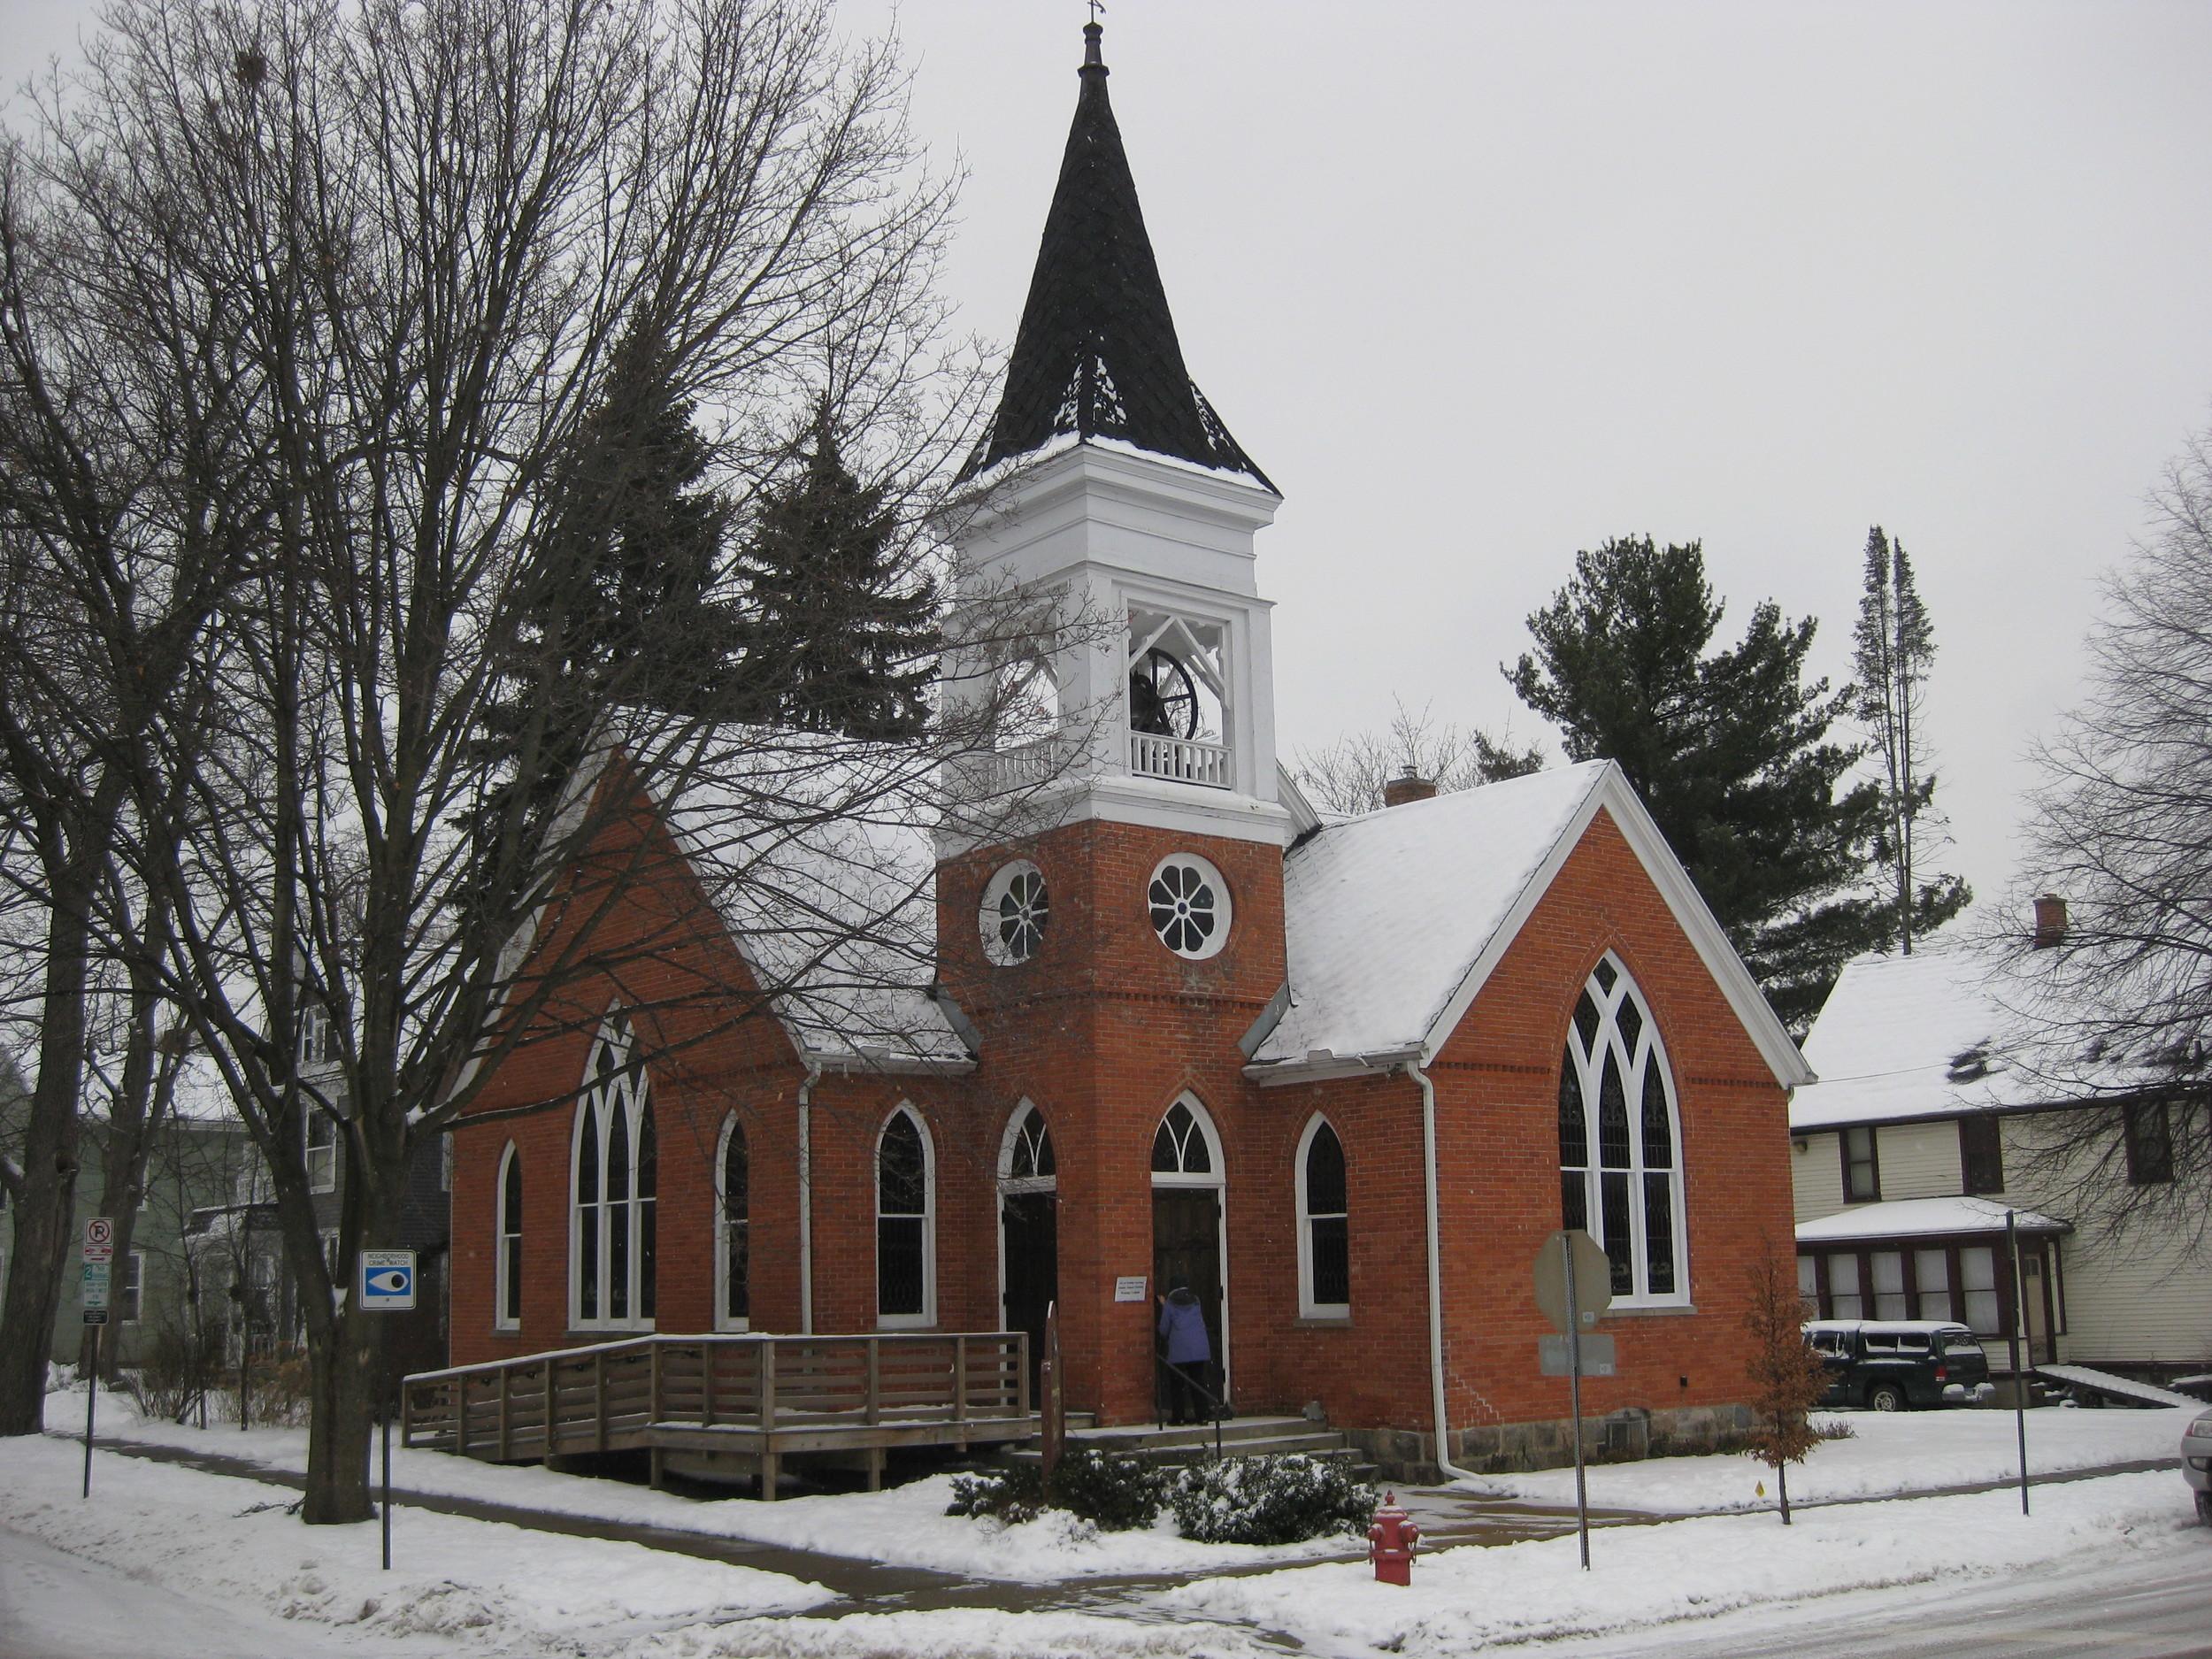 ANN ARBOR COMMUNITY OF CHRIST